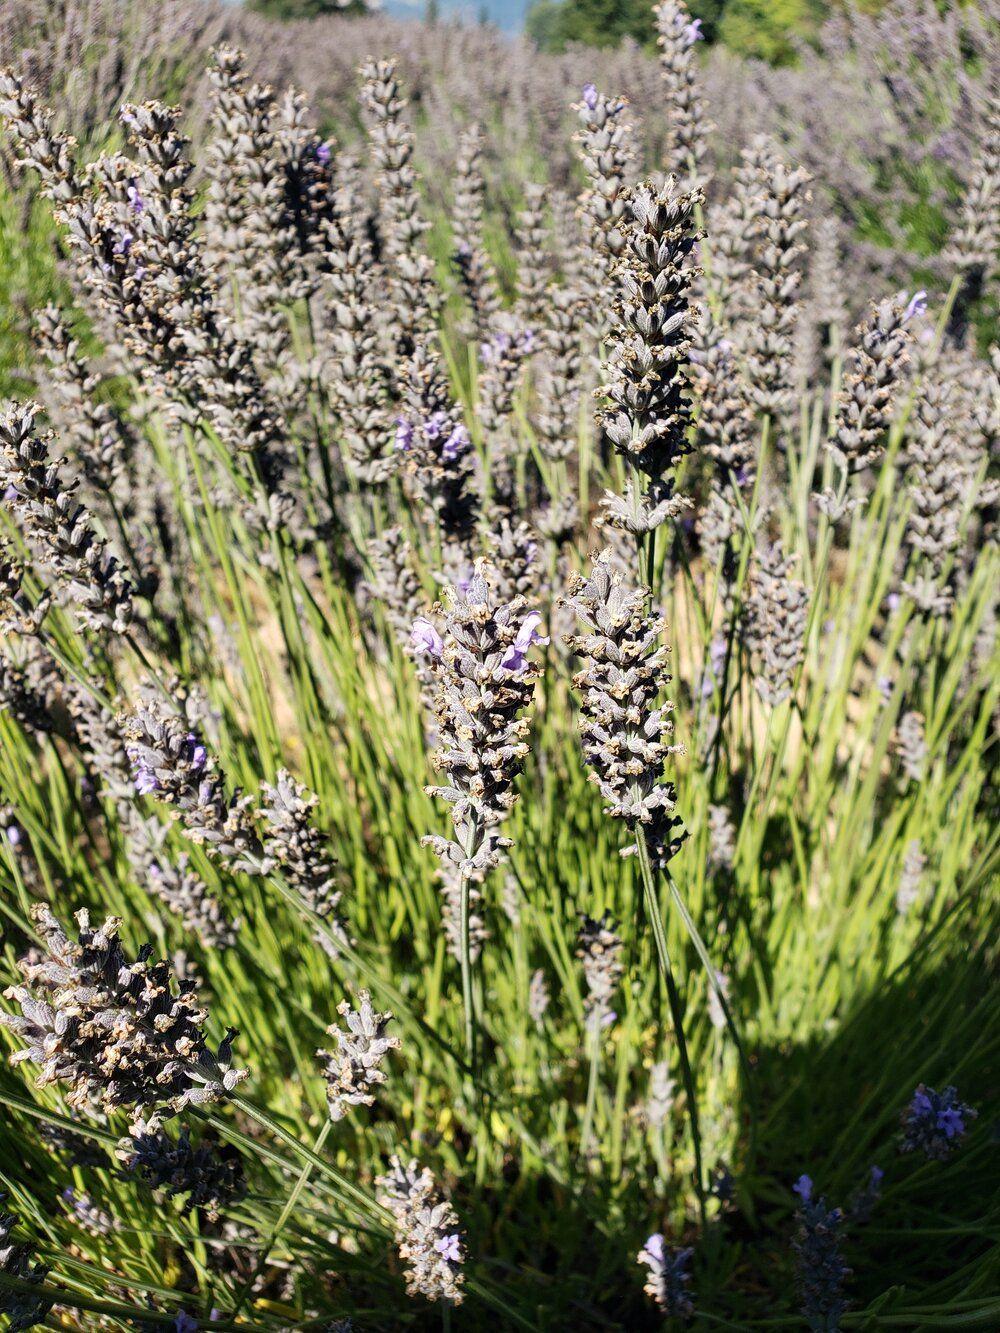 lavender valley hood river fruit loop oregon the sweet savory life in 2020 mount shasta mount shasta california shasta pinterest